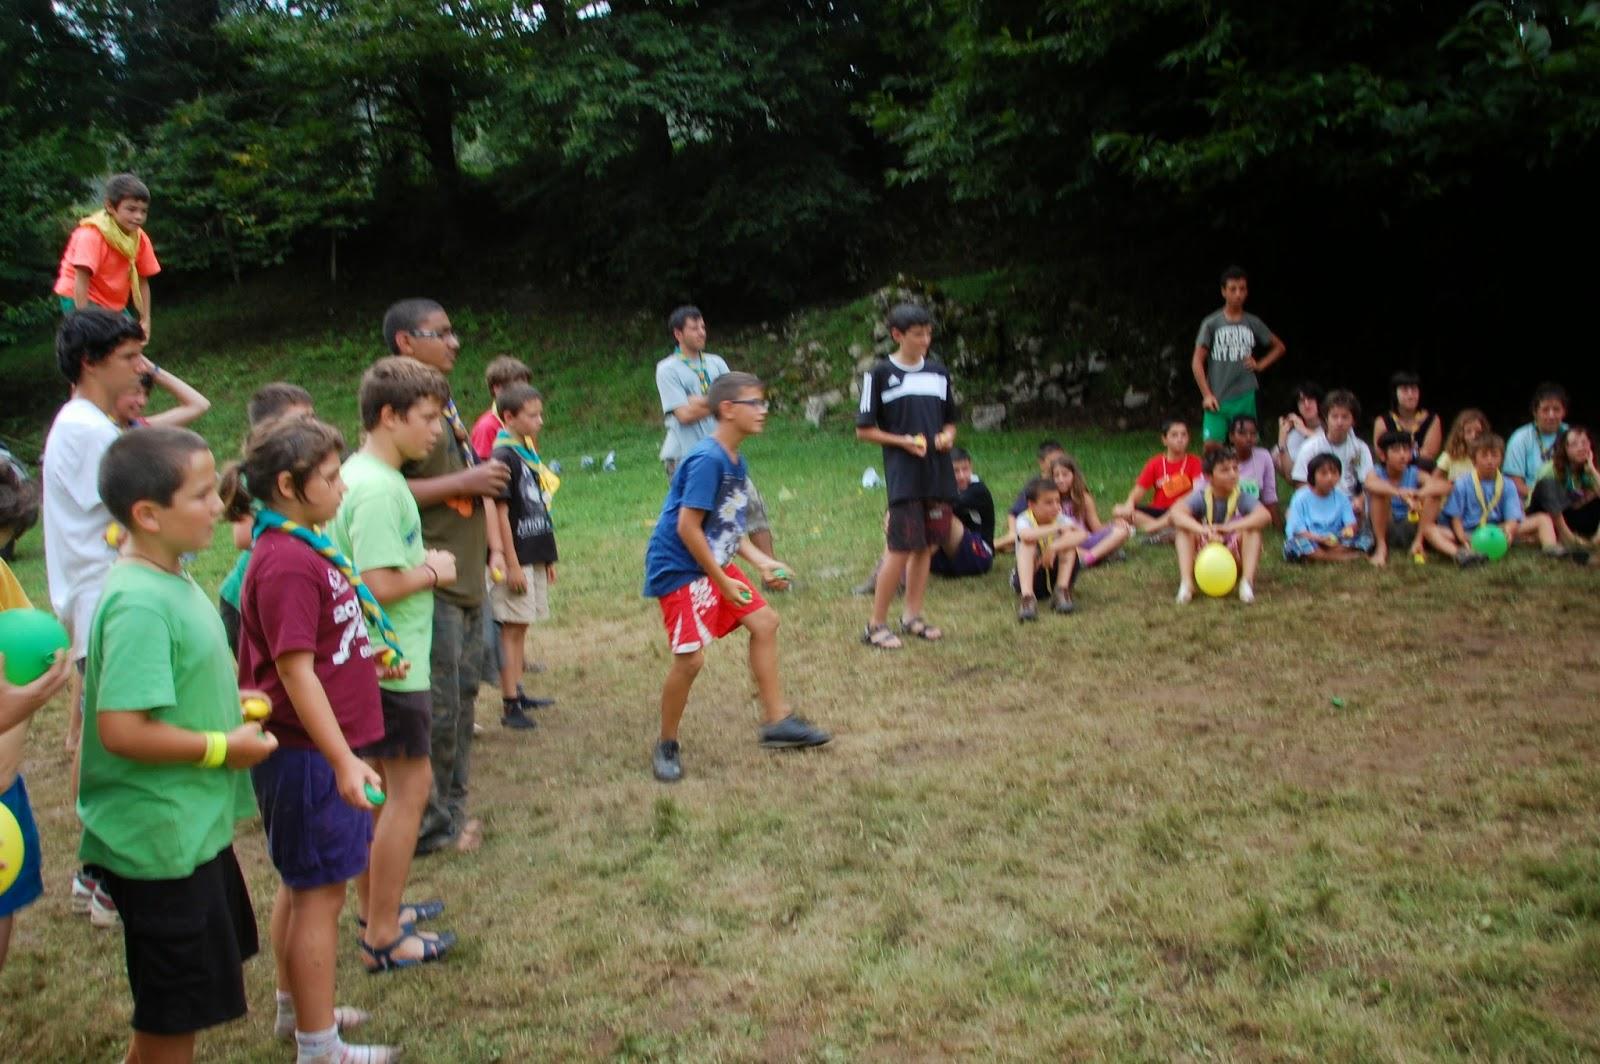 Campaments Estiu RolandKing 2011 - DSC_0261.JPG